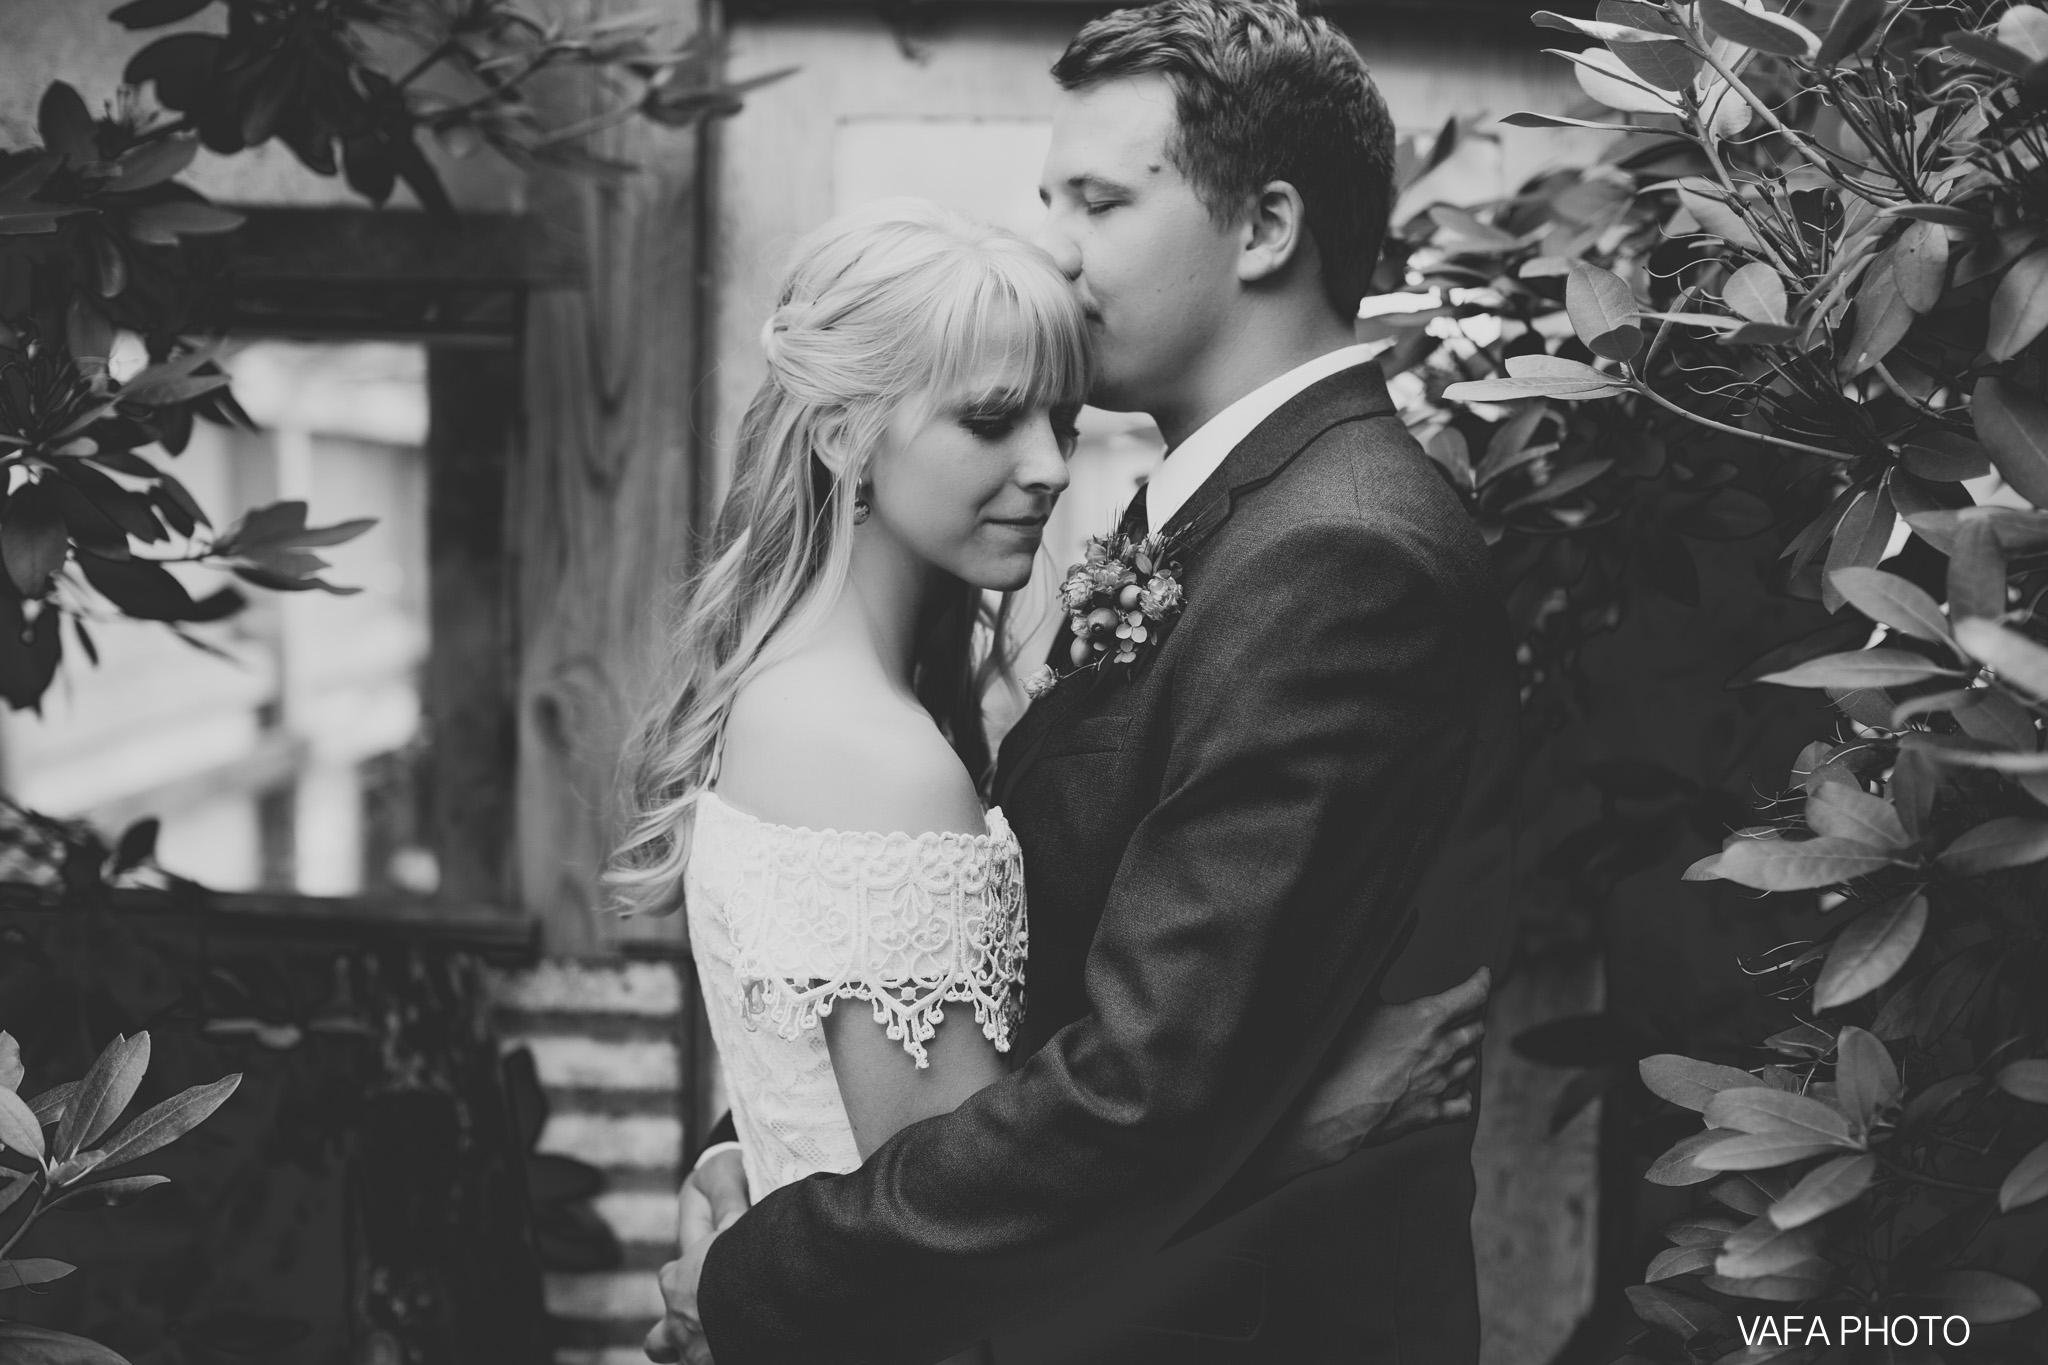 Belsolda-Farm-Wedding-Christy-Eric-Vafa-Photo-193.jpg